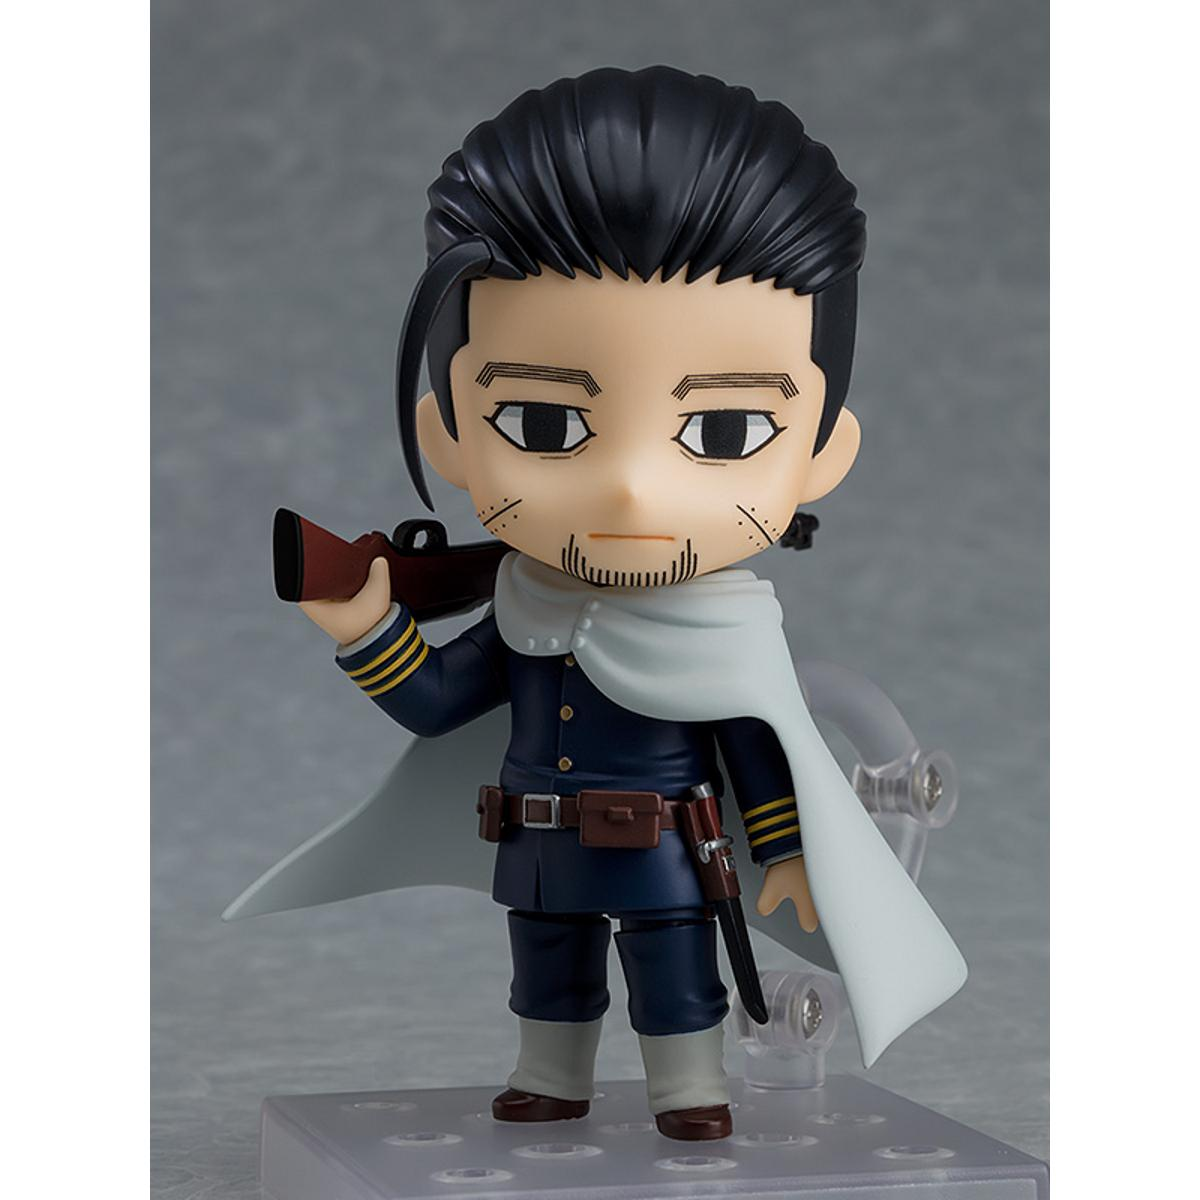 Nendoroid Hyakunosuke Ogata